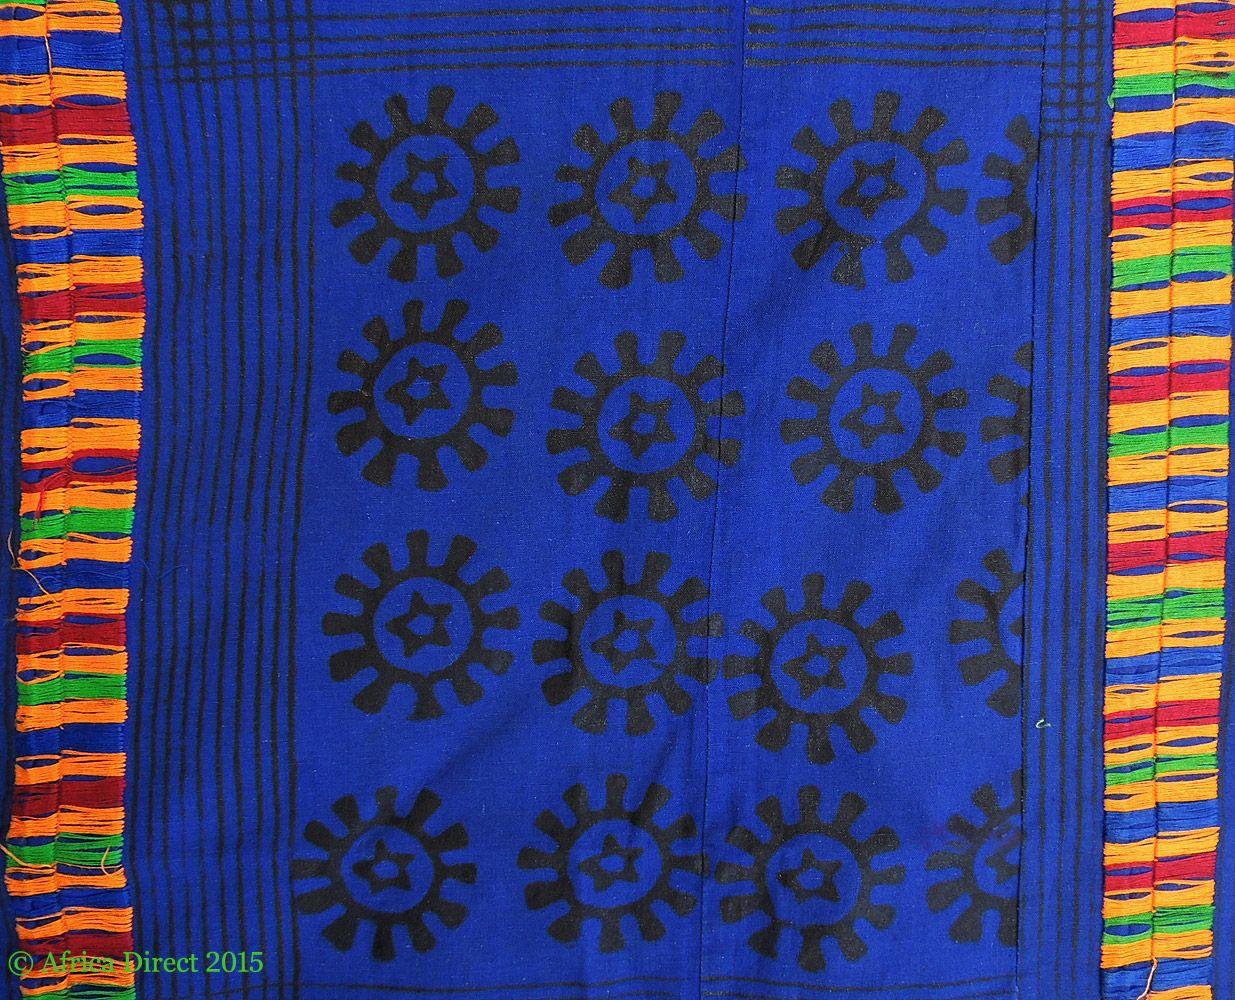 Adinkra Stamped Cloth Asante Ghana Large Africa 10 x 6 Feet - African Textiles - Wall Art